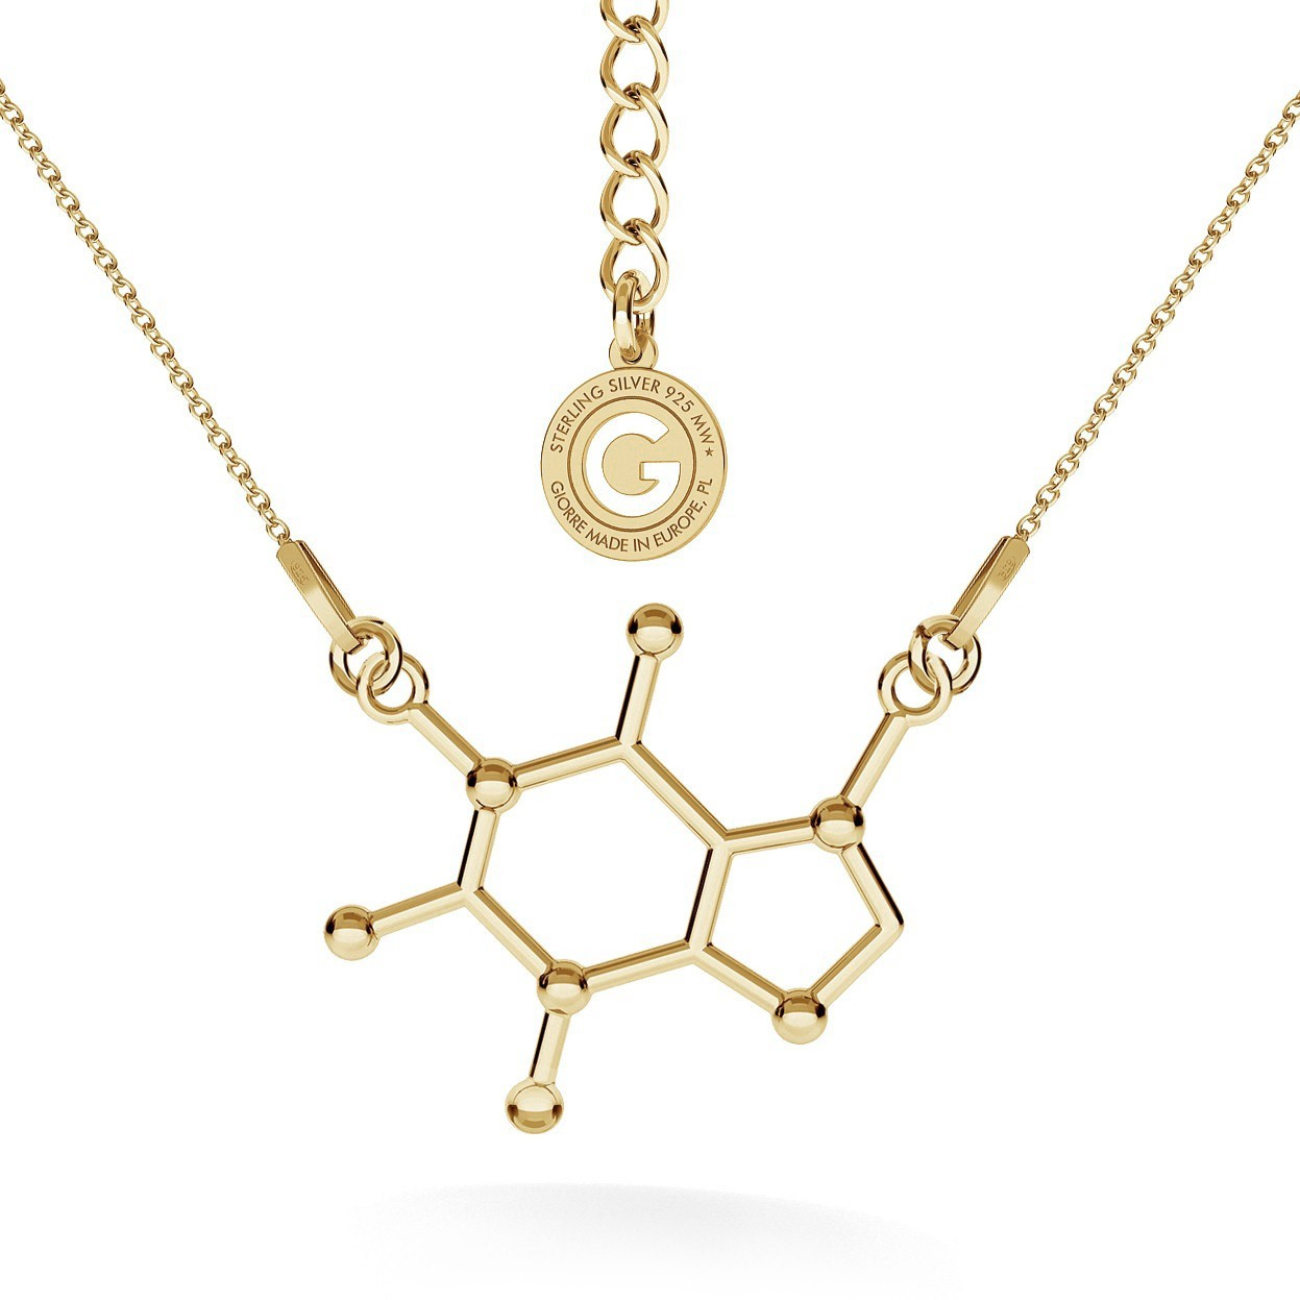 Necklace CAFFEINE chemical formula